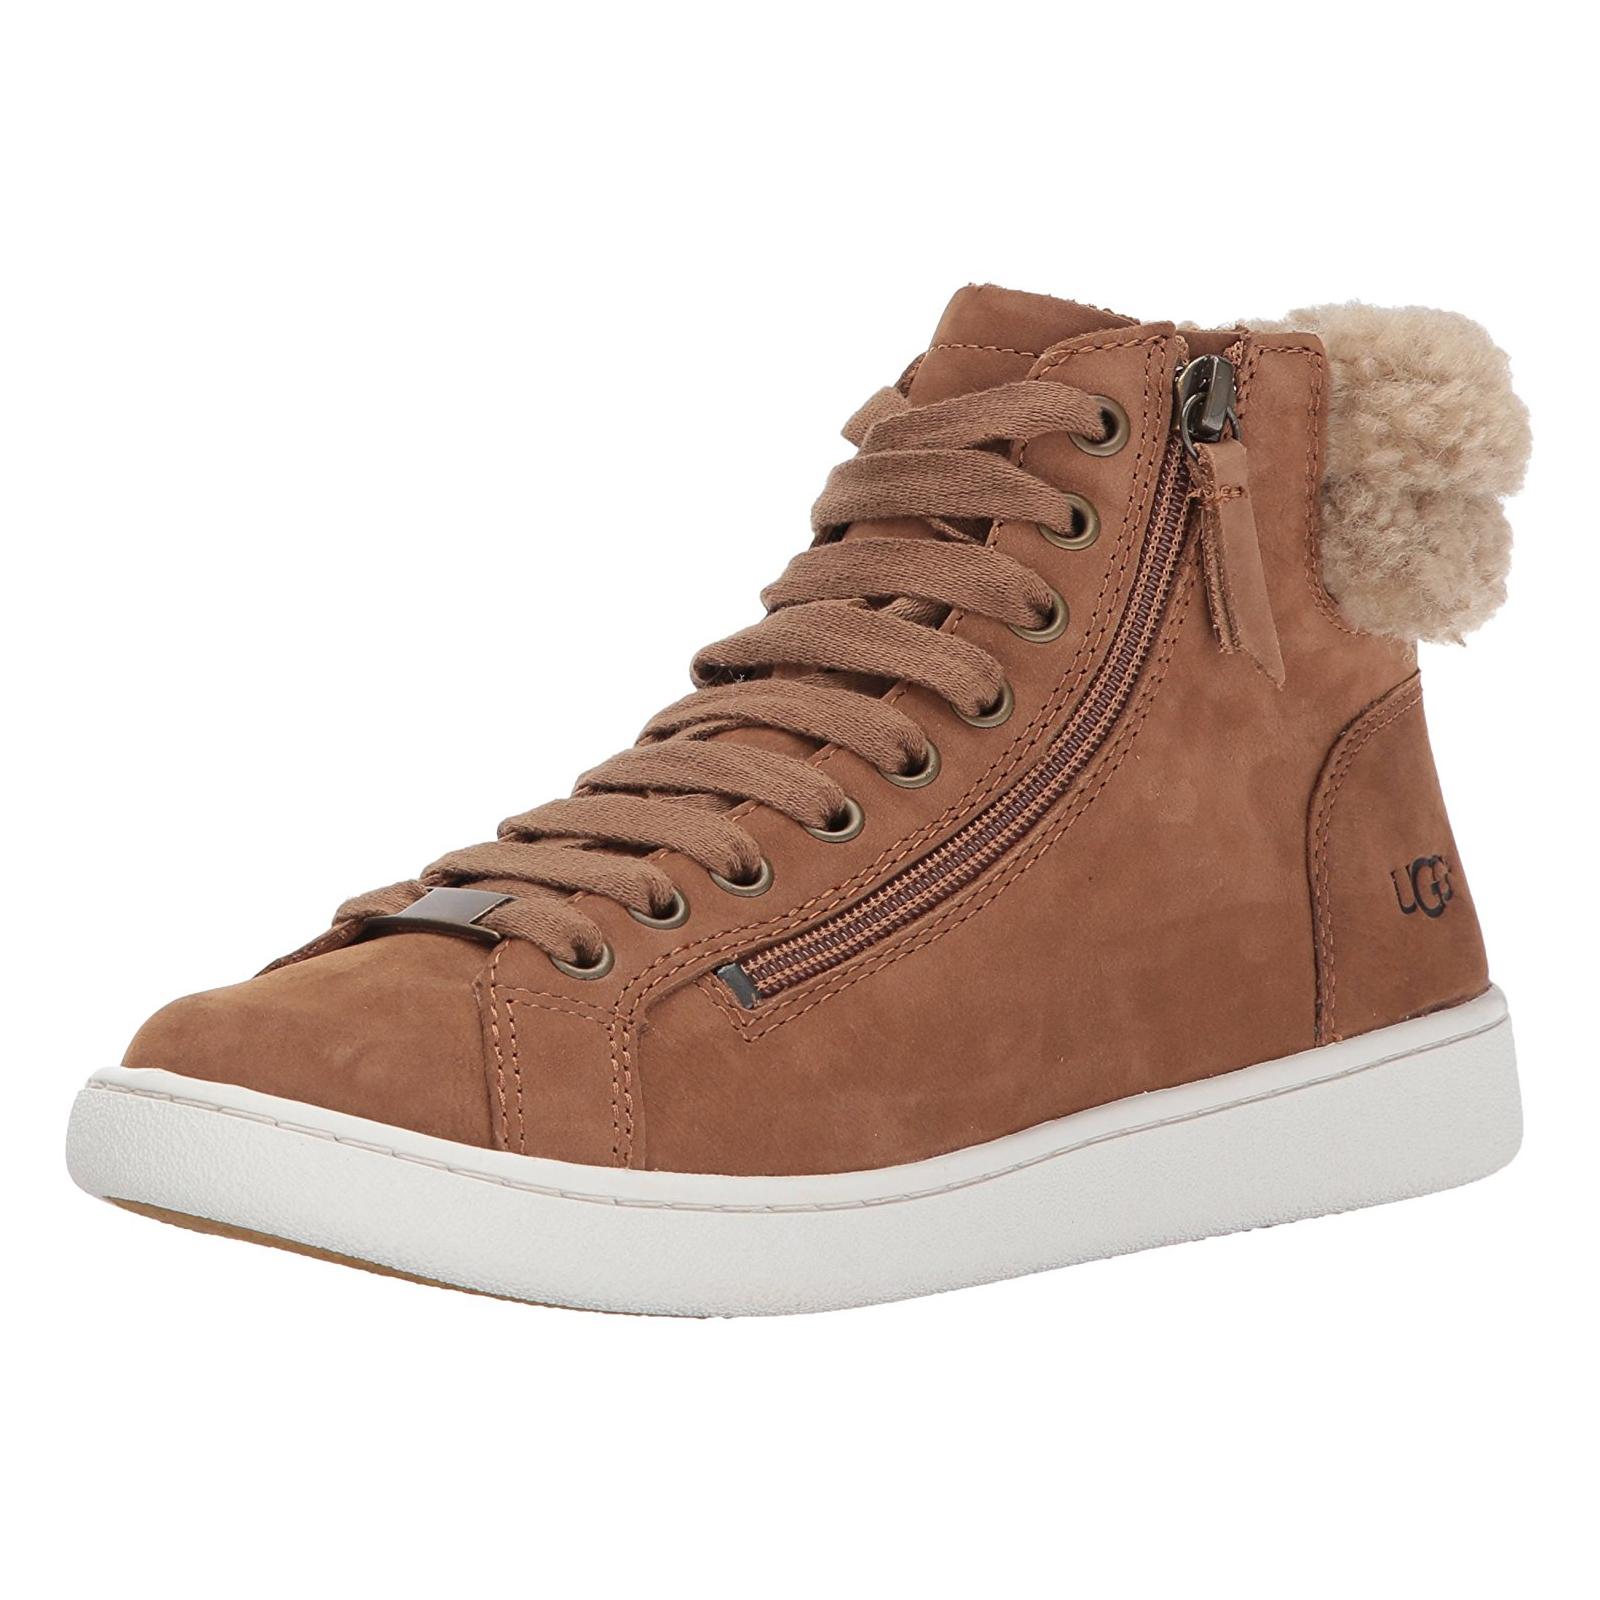 Ugg Sneakers Olive Chestnut Brown